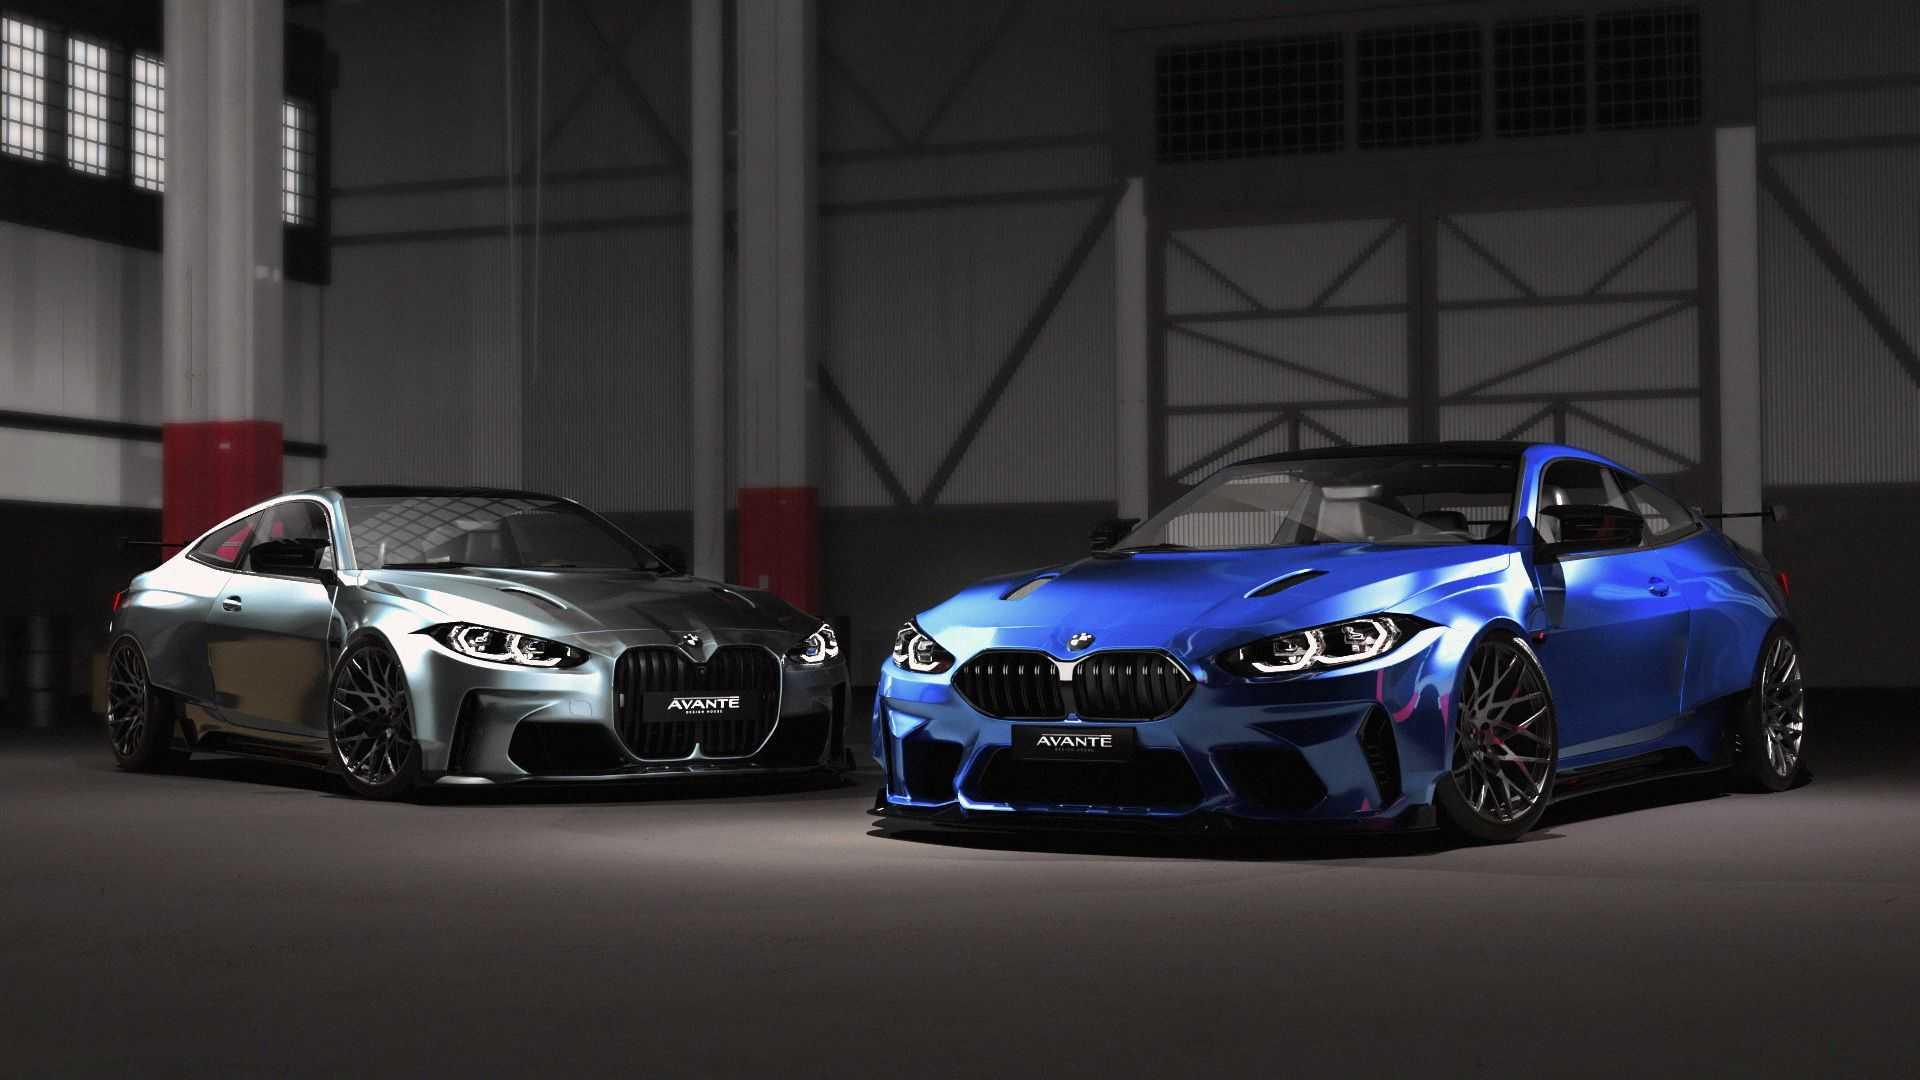 BMW-M4-by-Avante-Design-4